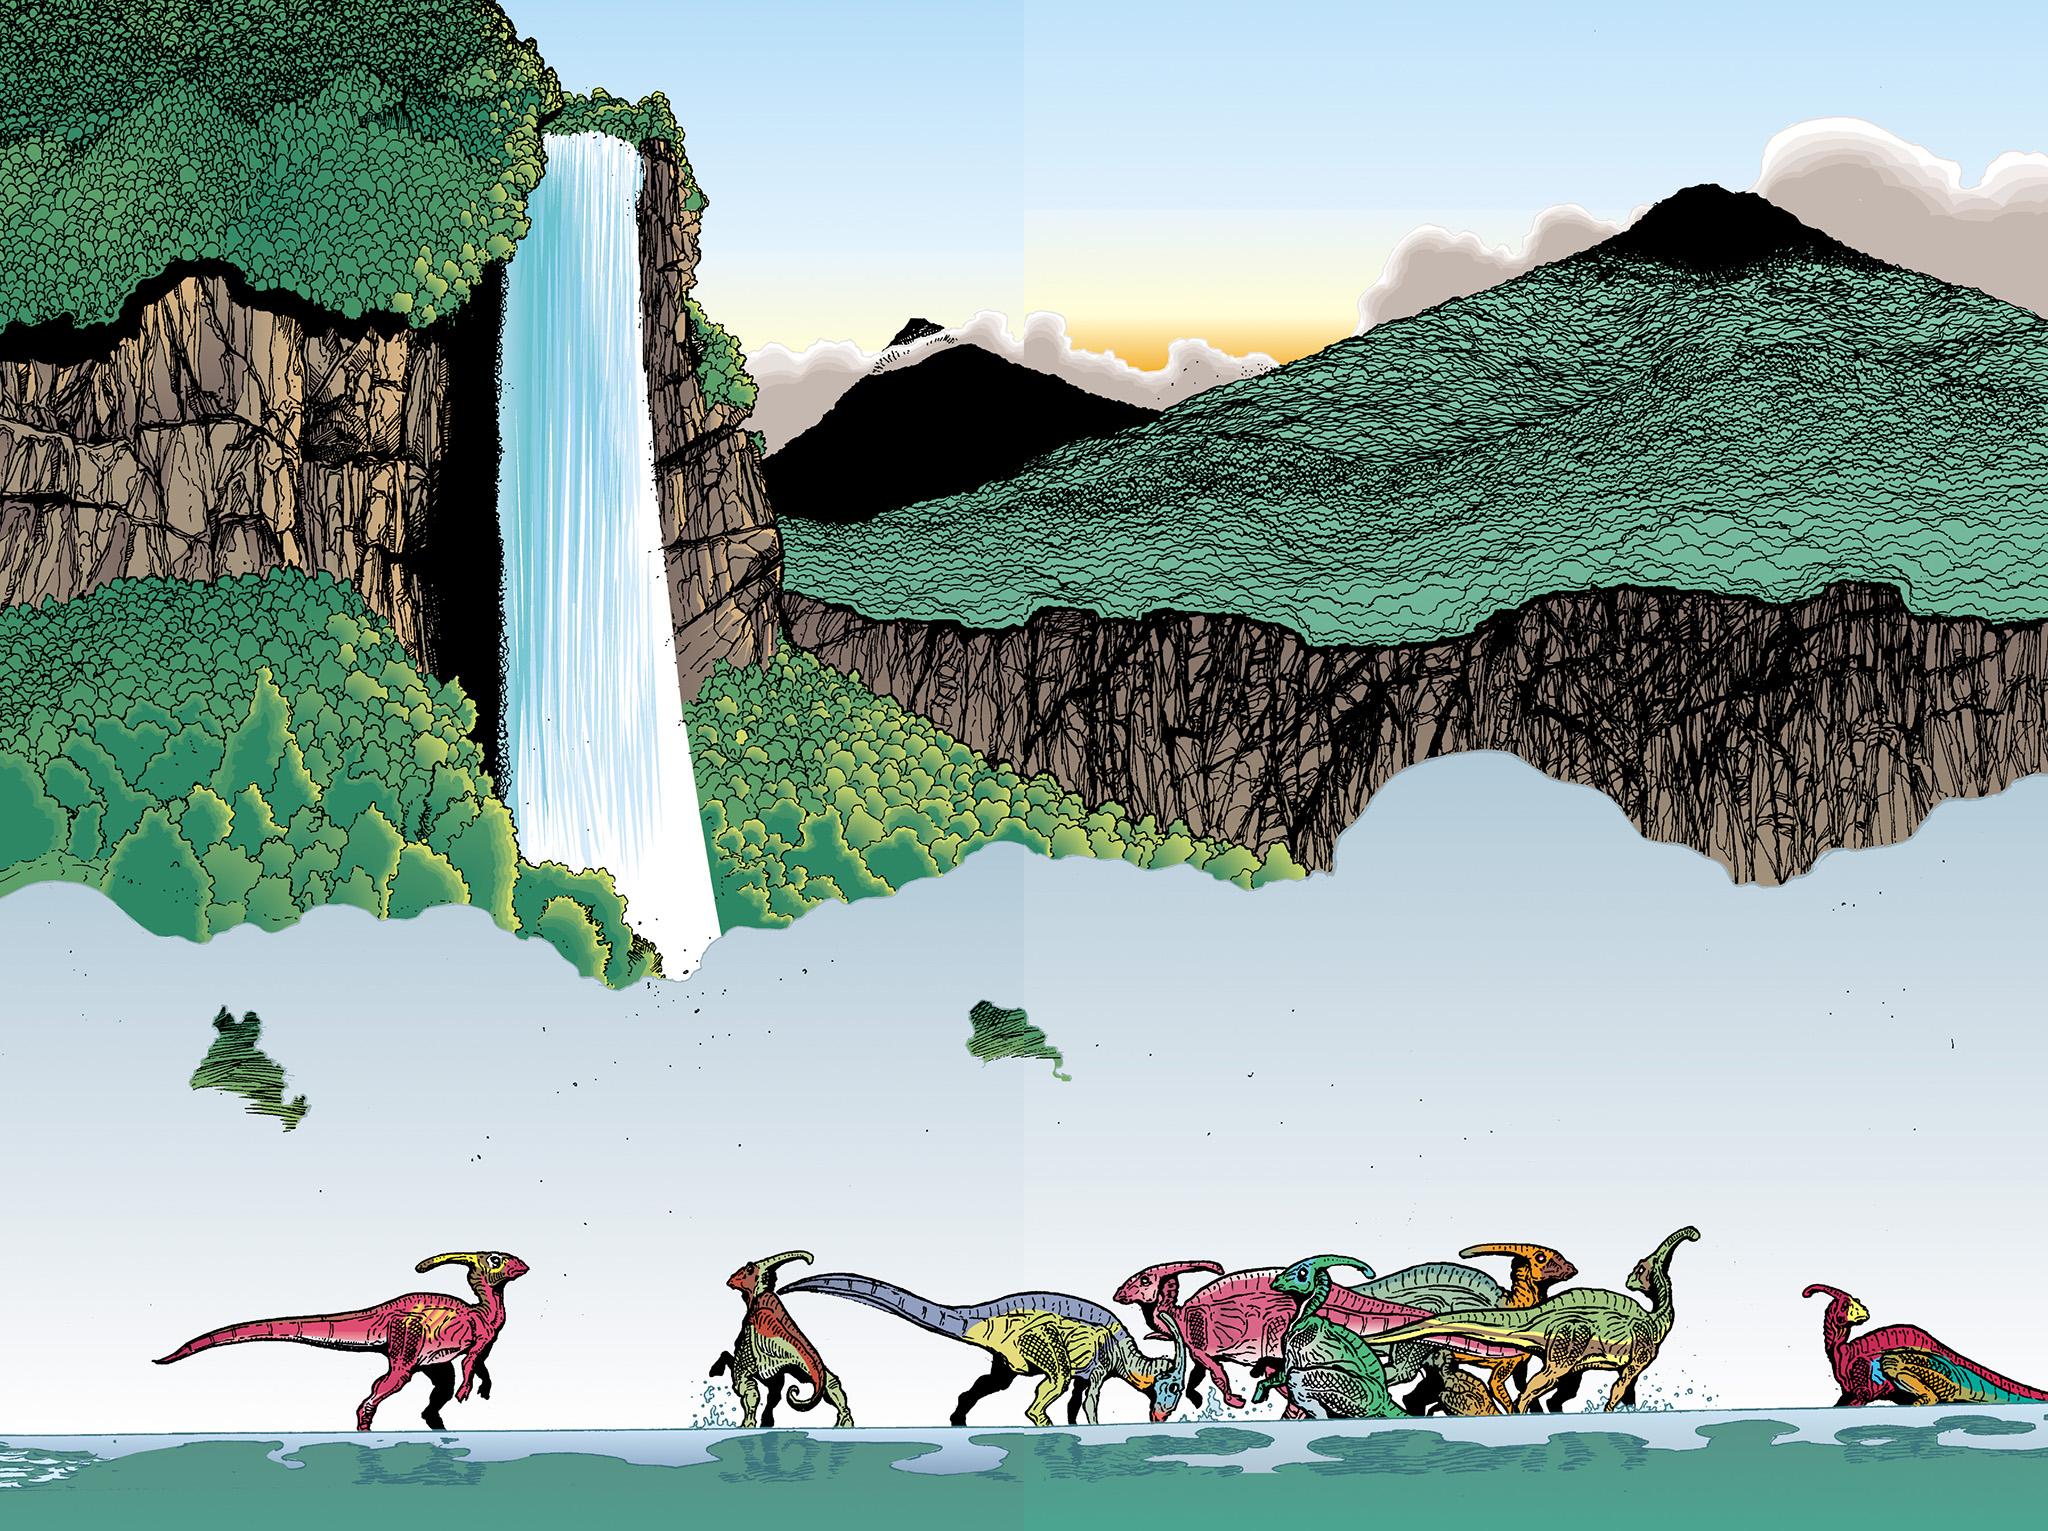 Age of Reptiles Omnibus Chap 2 - Next Chap 3